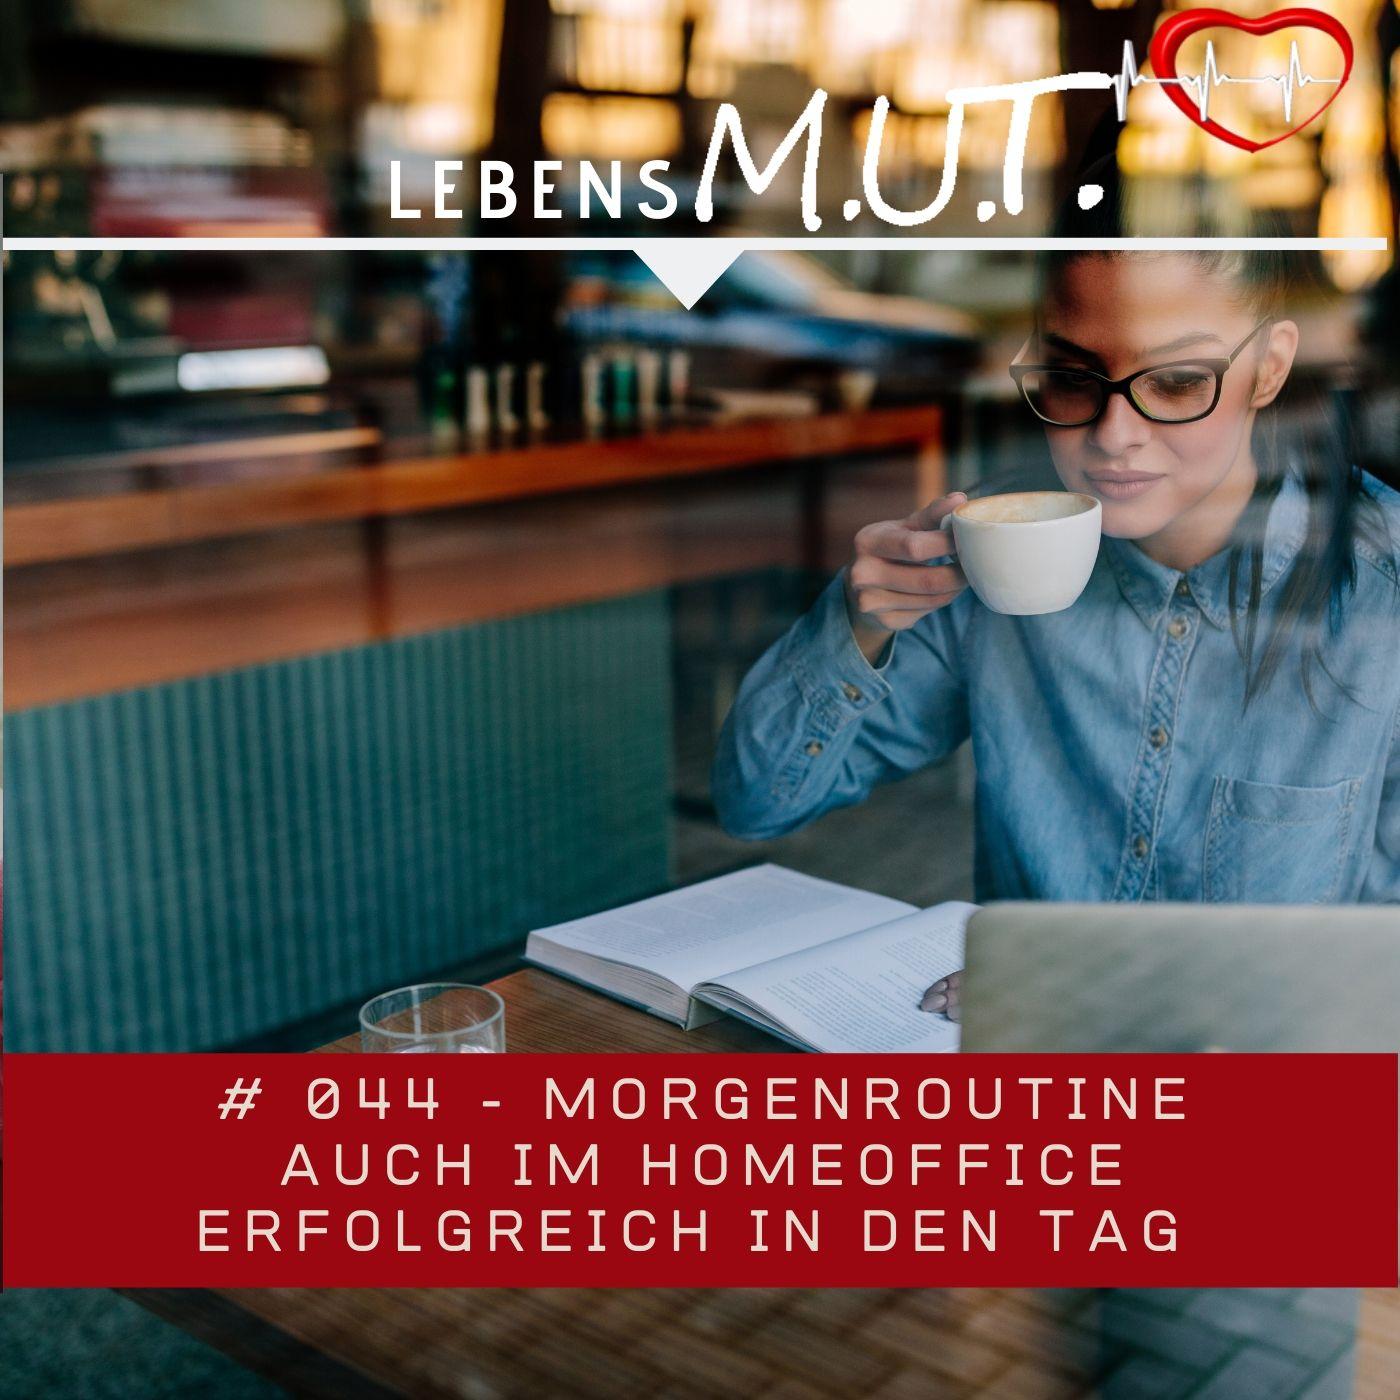 21 Deine Morgenroutine – Lebensmut Podcast – Podcast – Podtail